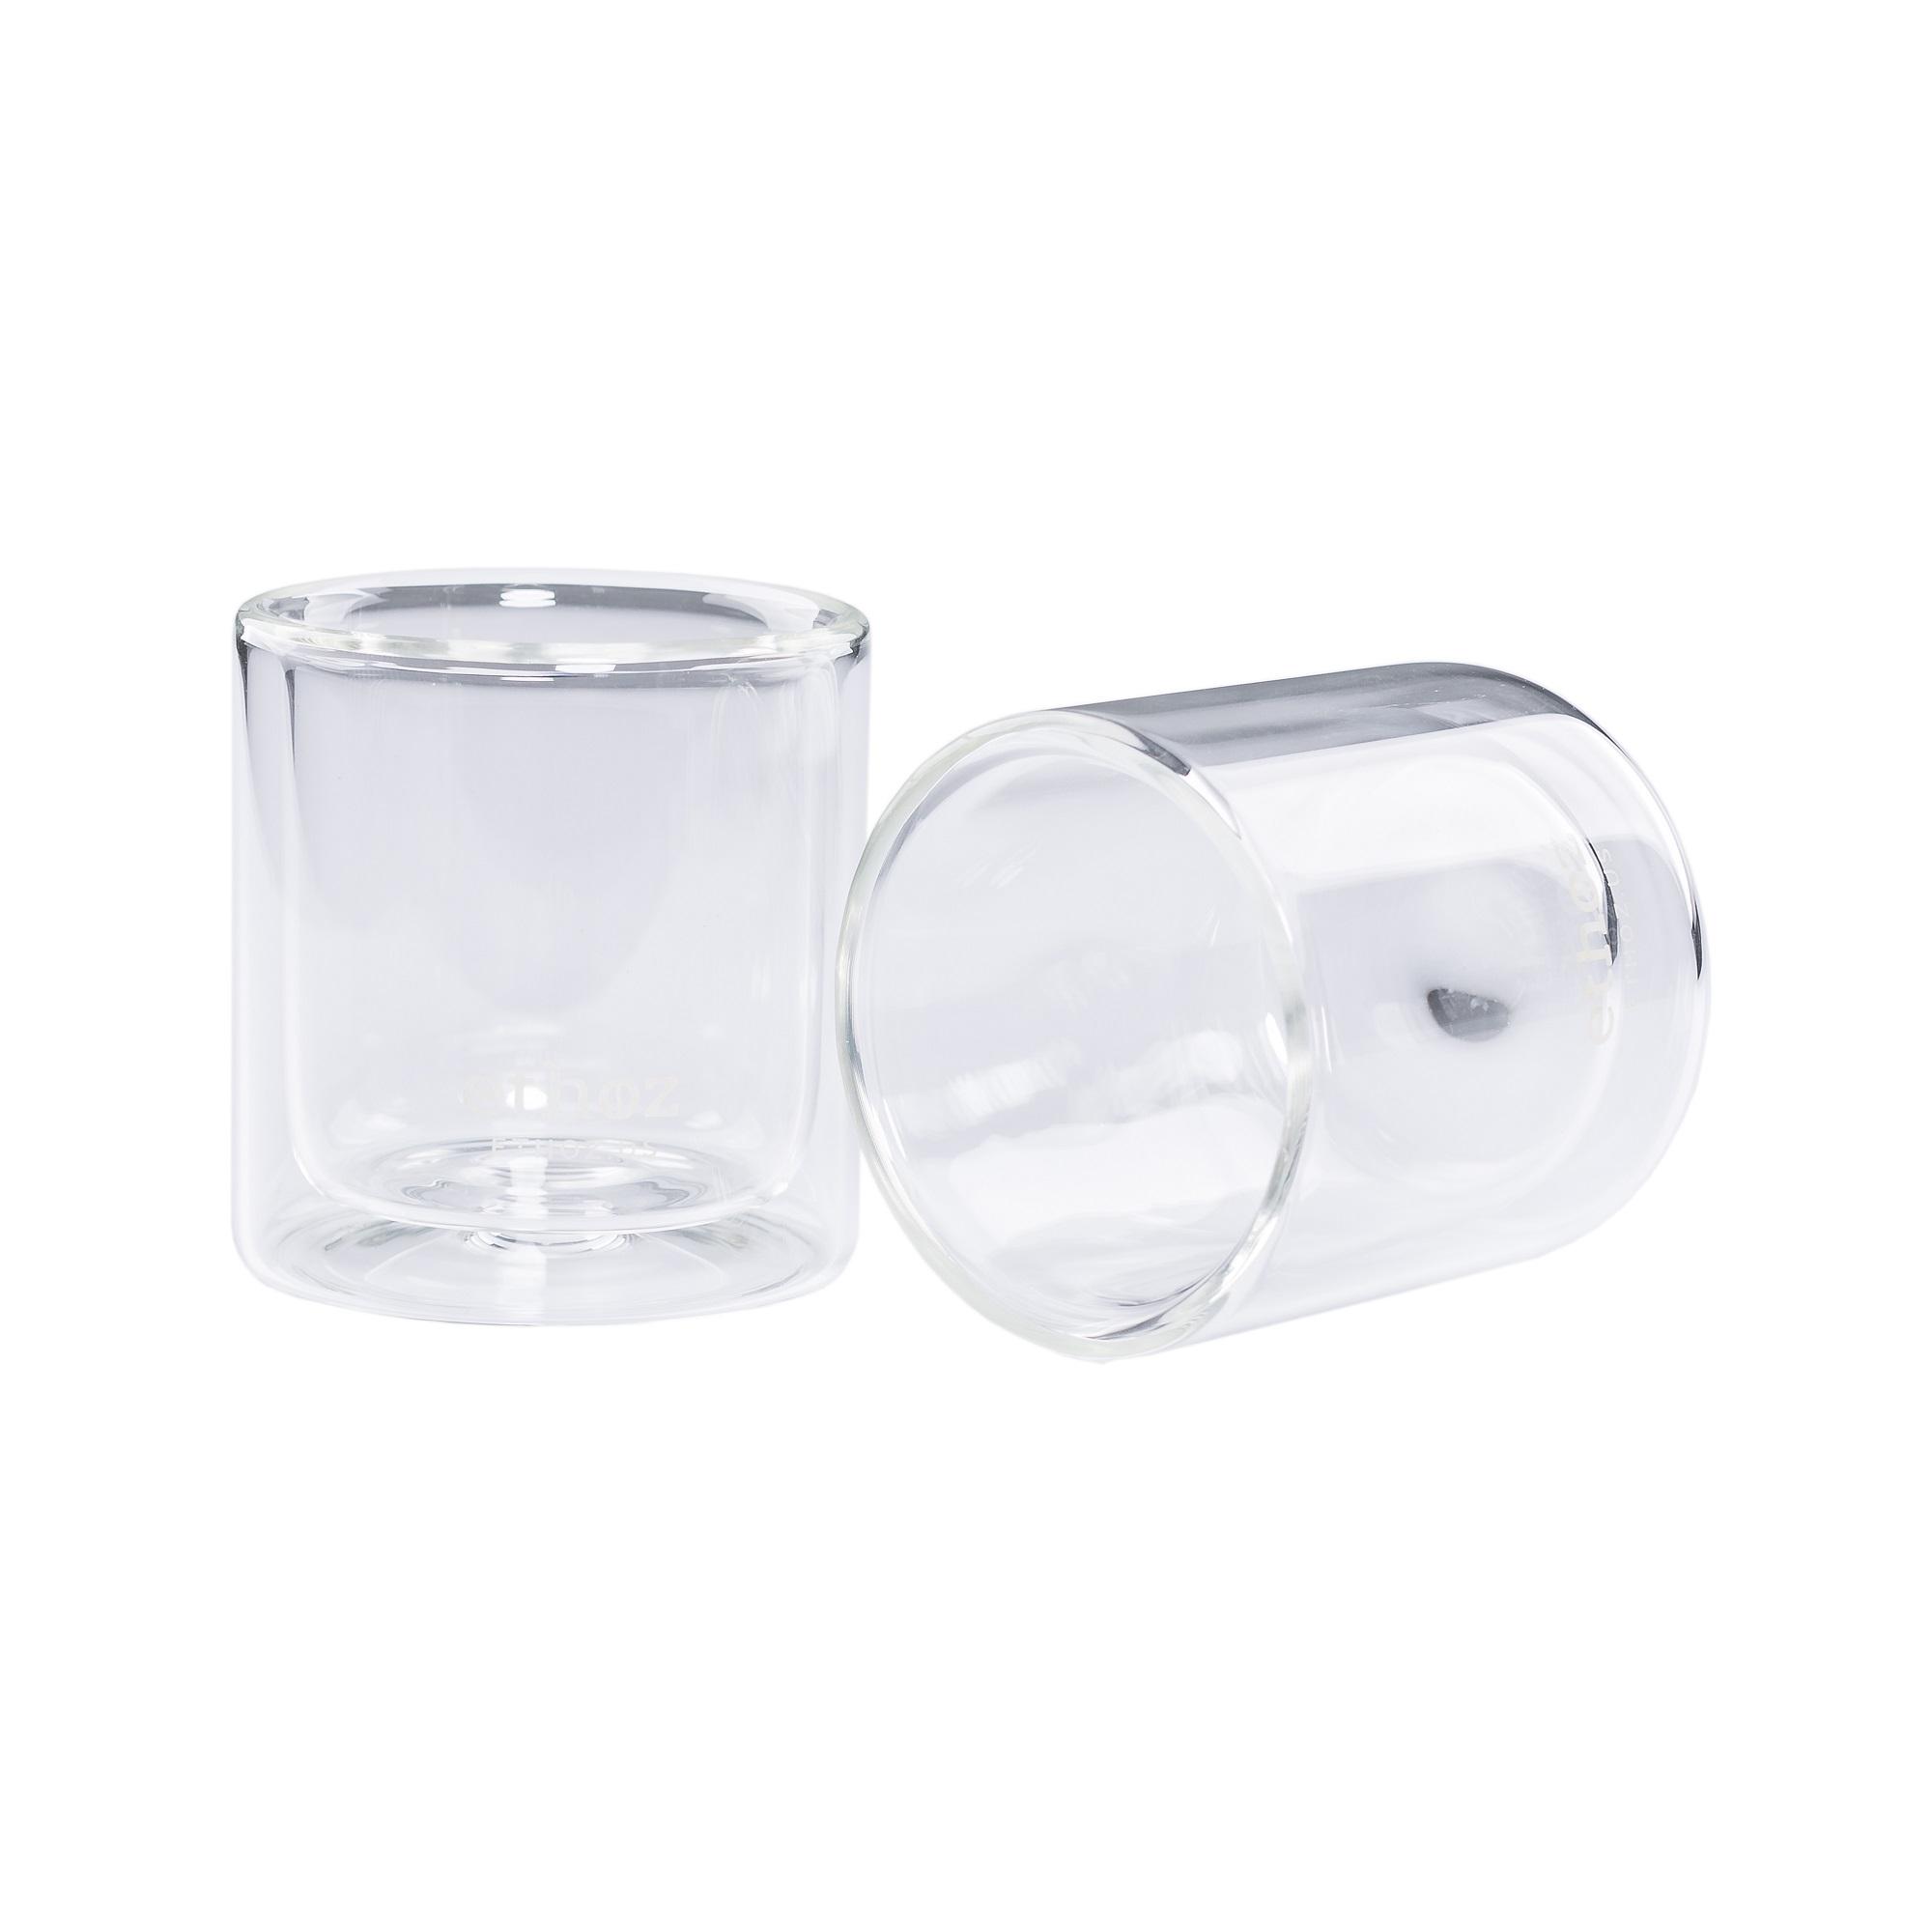 Planetary Design Ethoz Double Wall Glass Cups set of 2 6oz  - FK TM 08